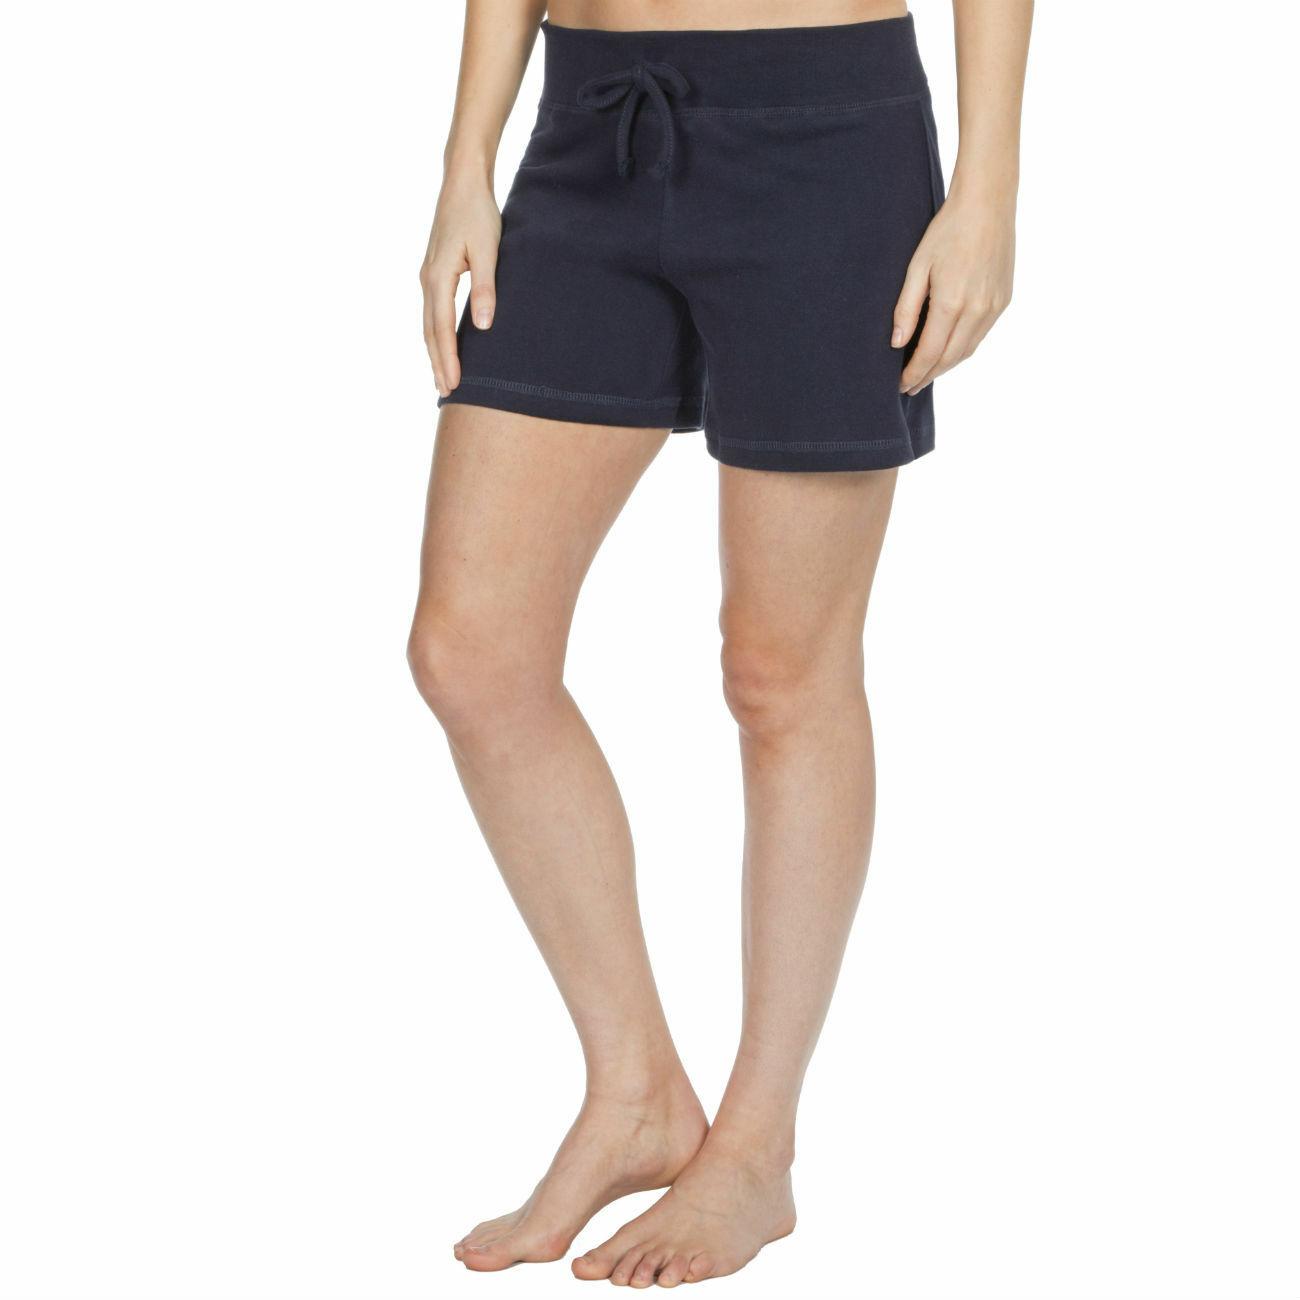 Womens-Cotton-Jersey-Shorts-Elastic-Waist-Summer-Beach-Casual-Yoga-Hot-Pants-New thumbnail 11